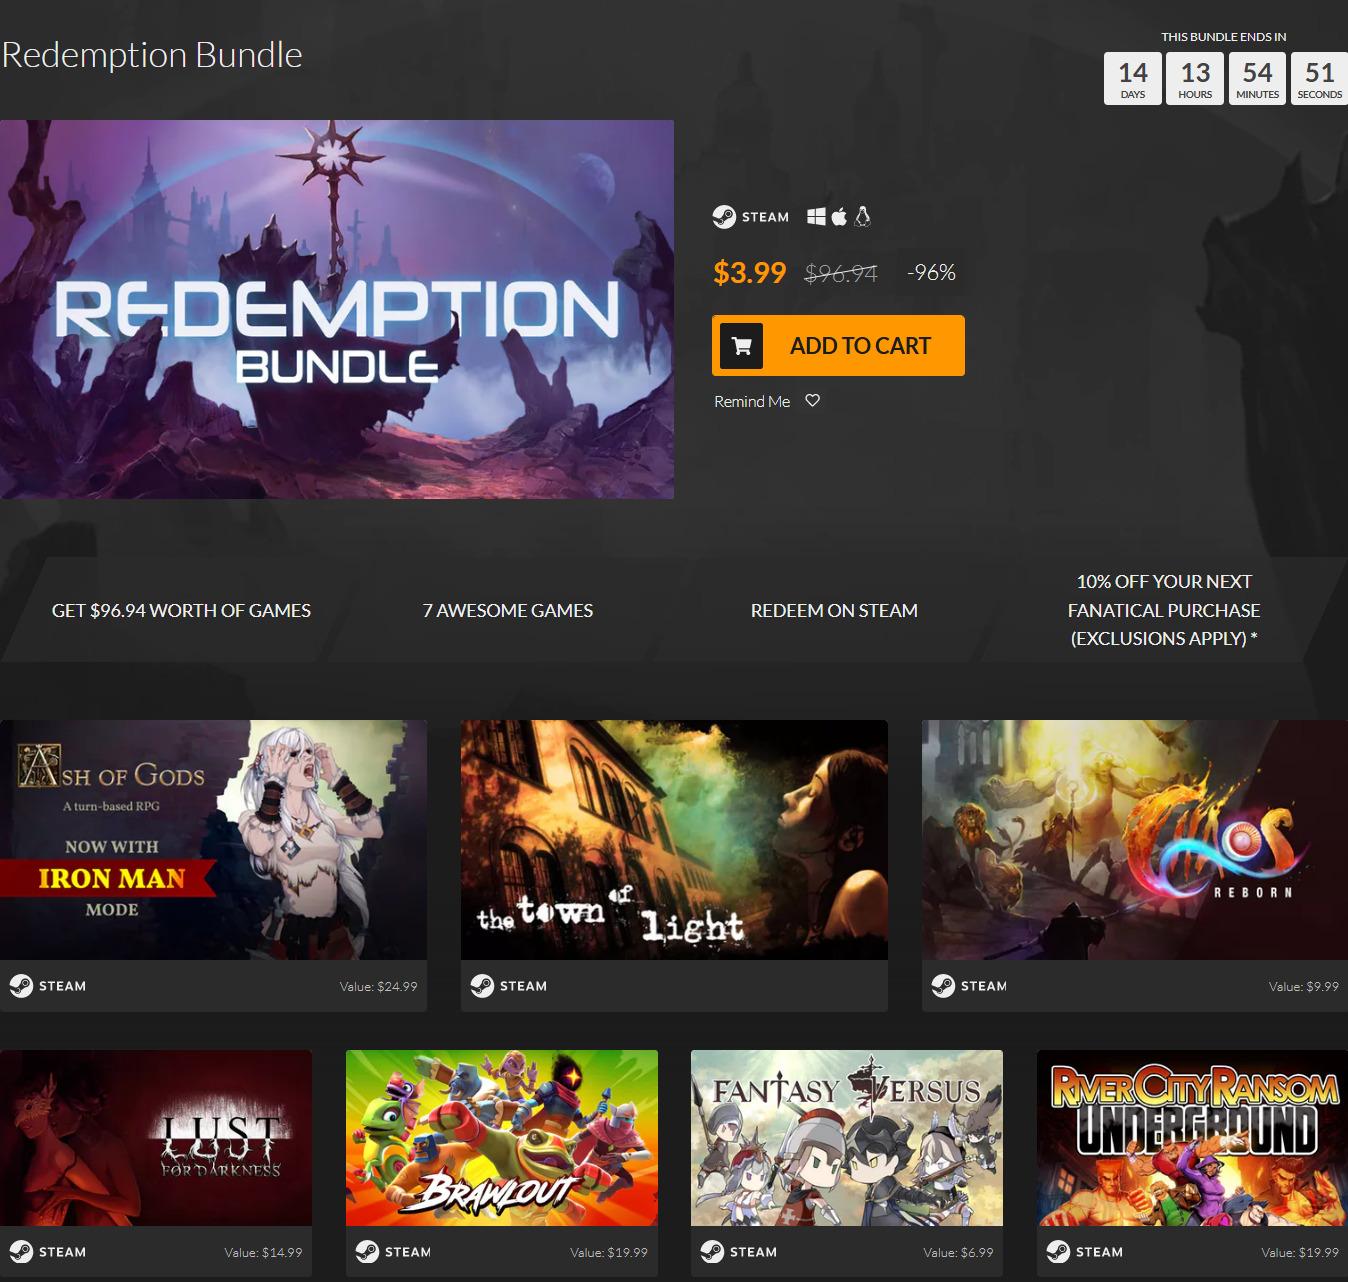 Screenshot_2019-08-01 Redemption Bundle Steam Game Bundle Fanatical.jpg